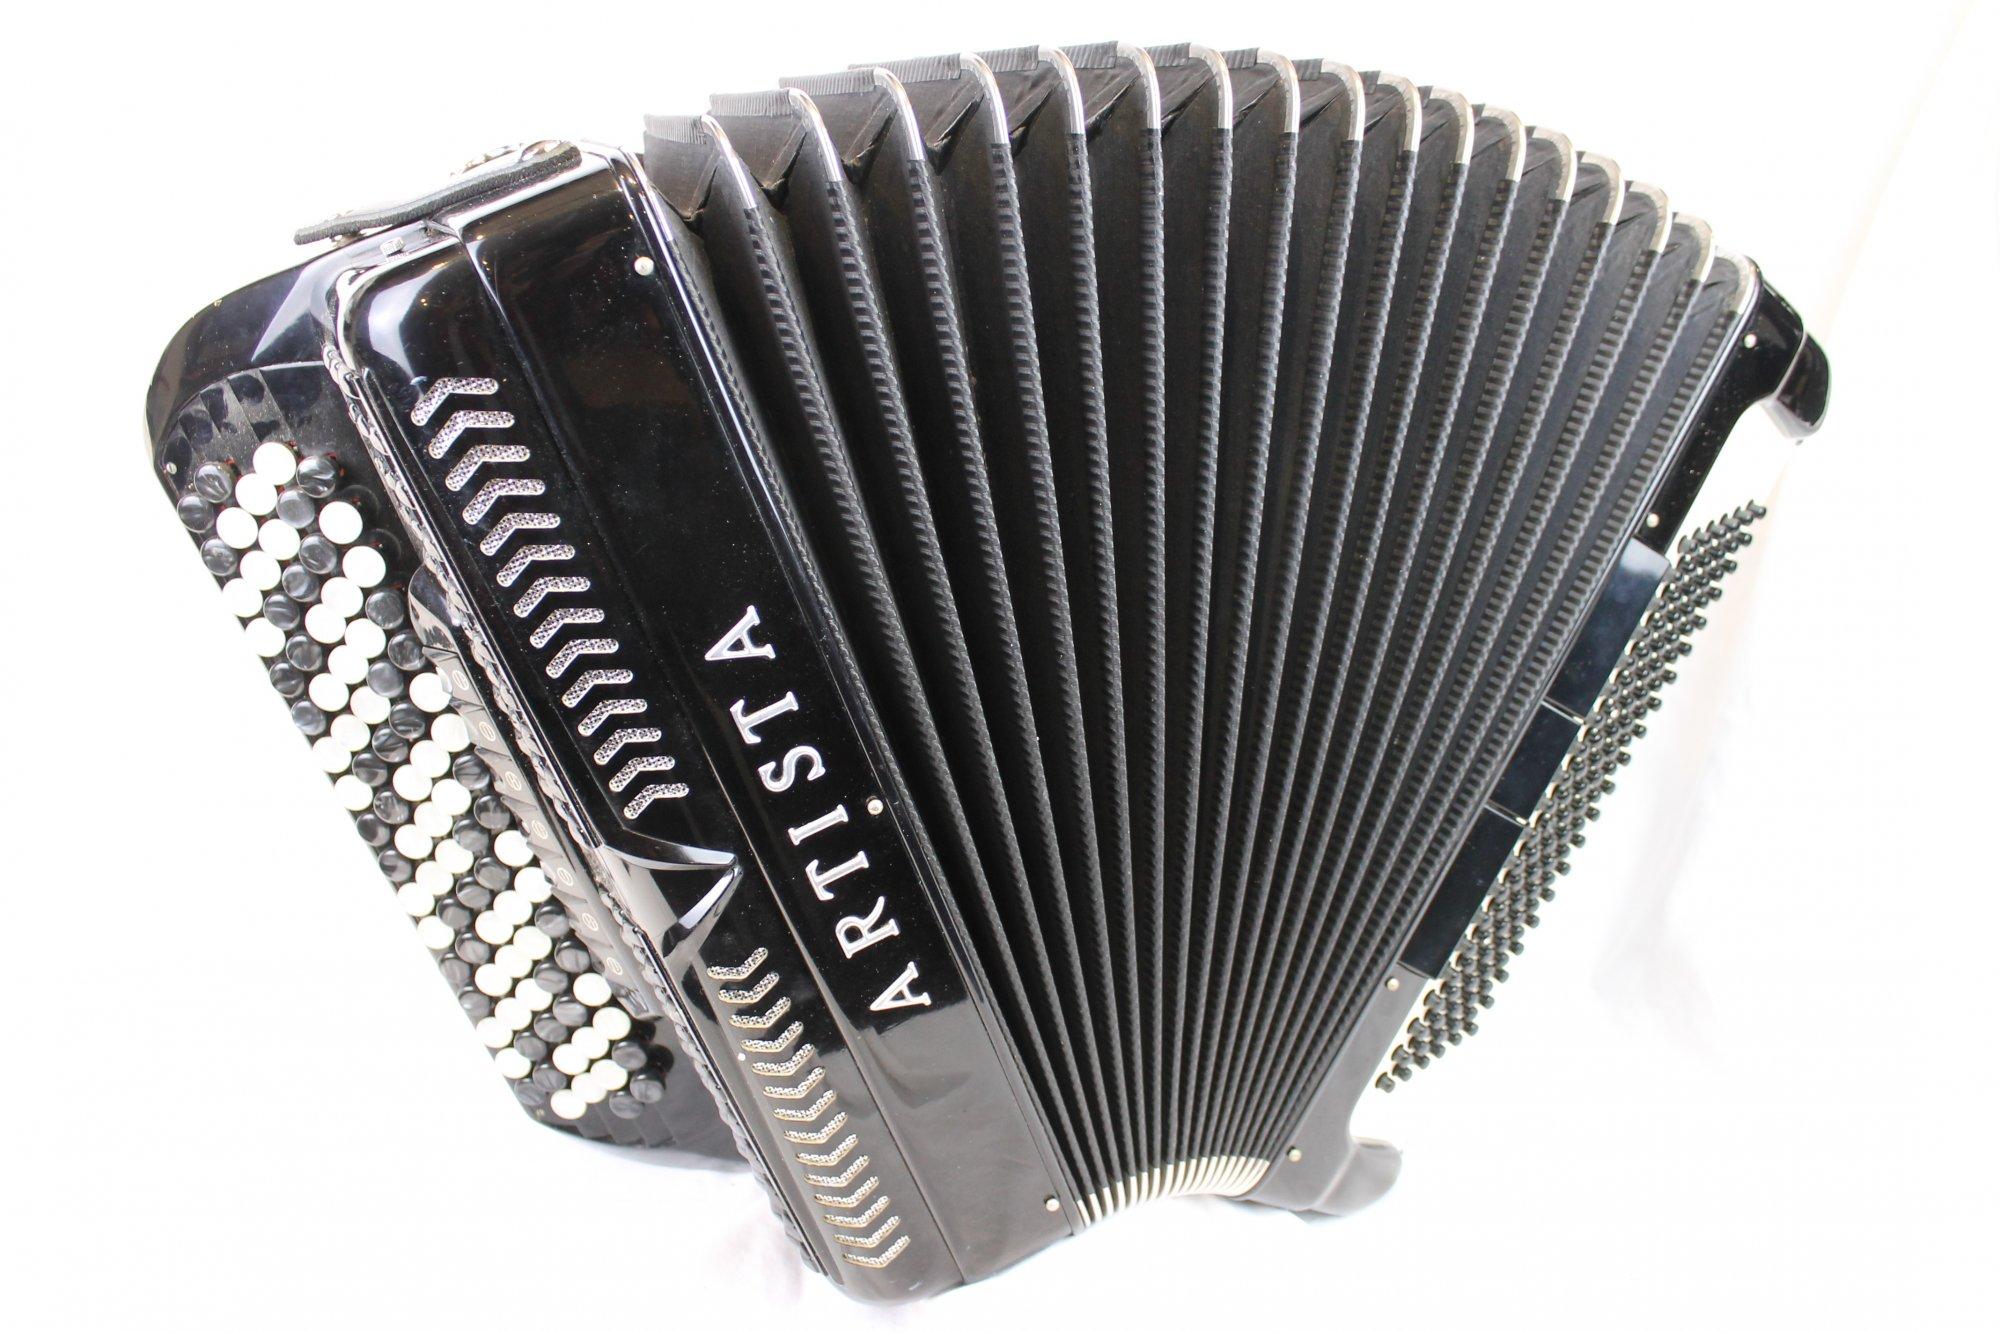 3813 - Black Artista Chromatic Button Accordion C System LMM 87 120